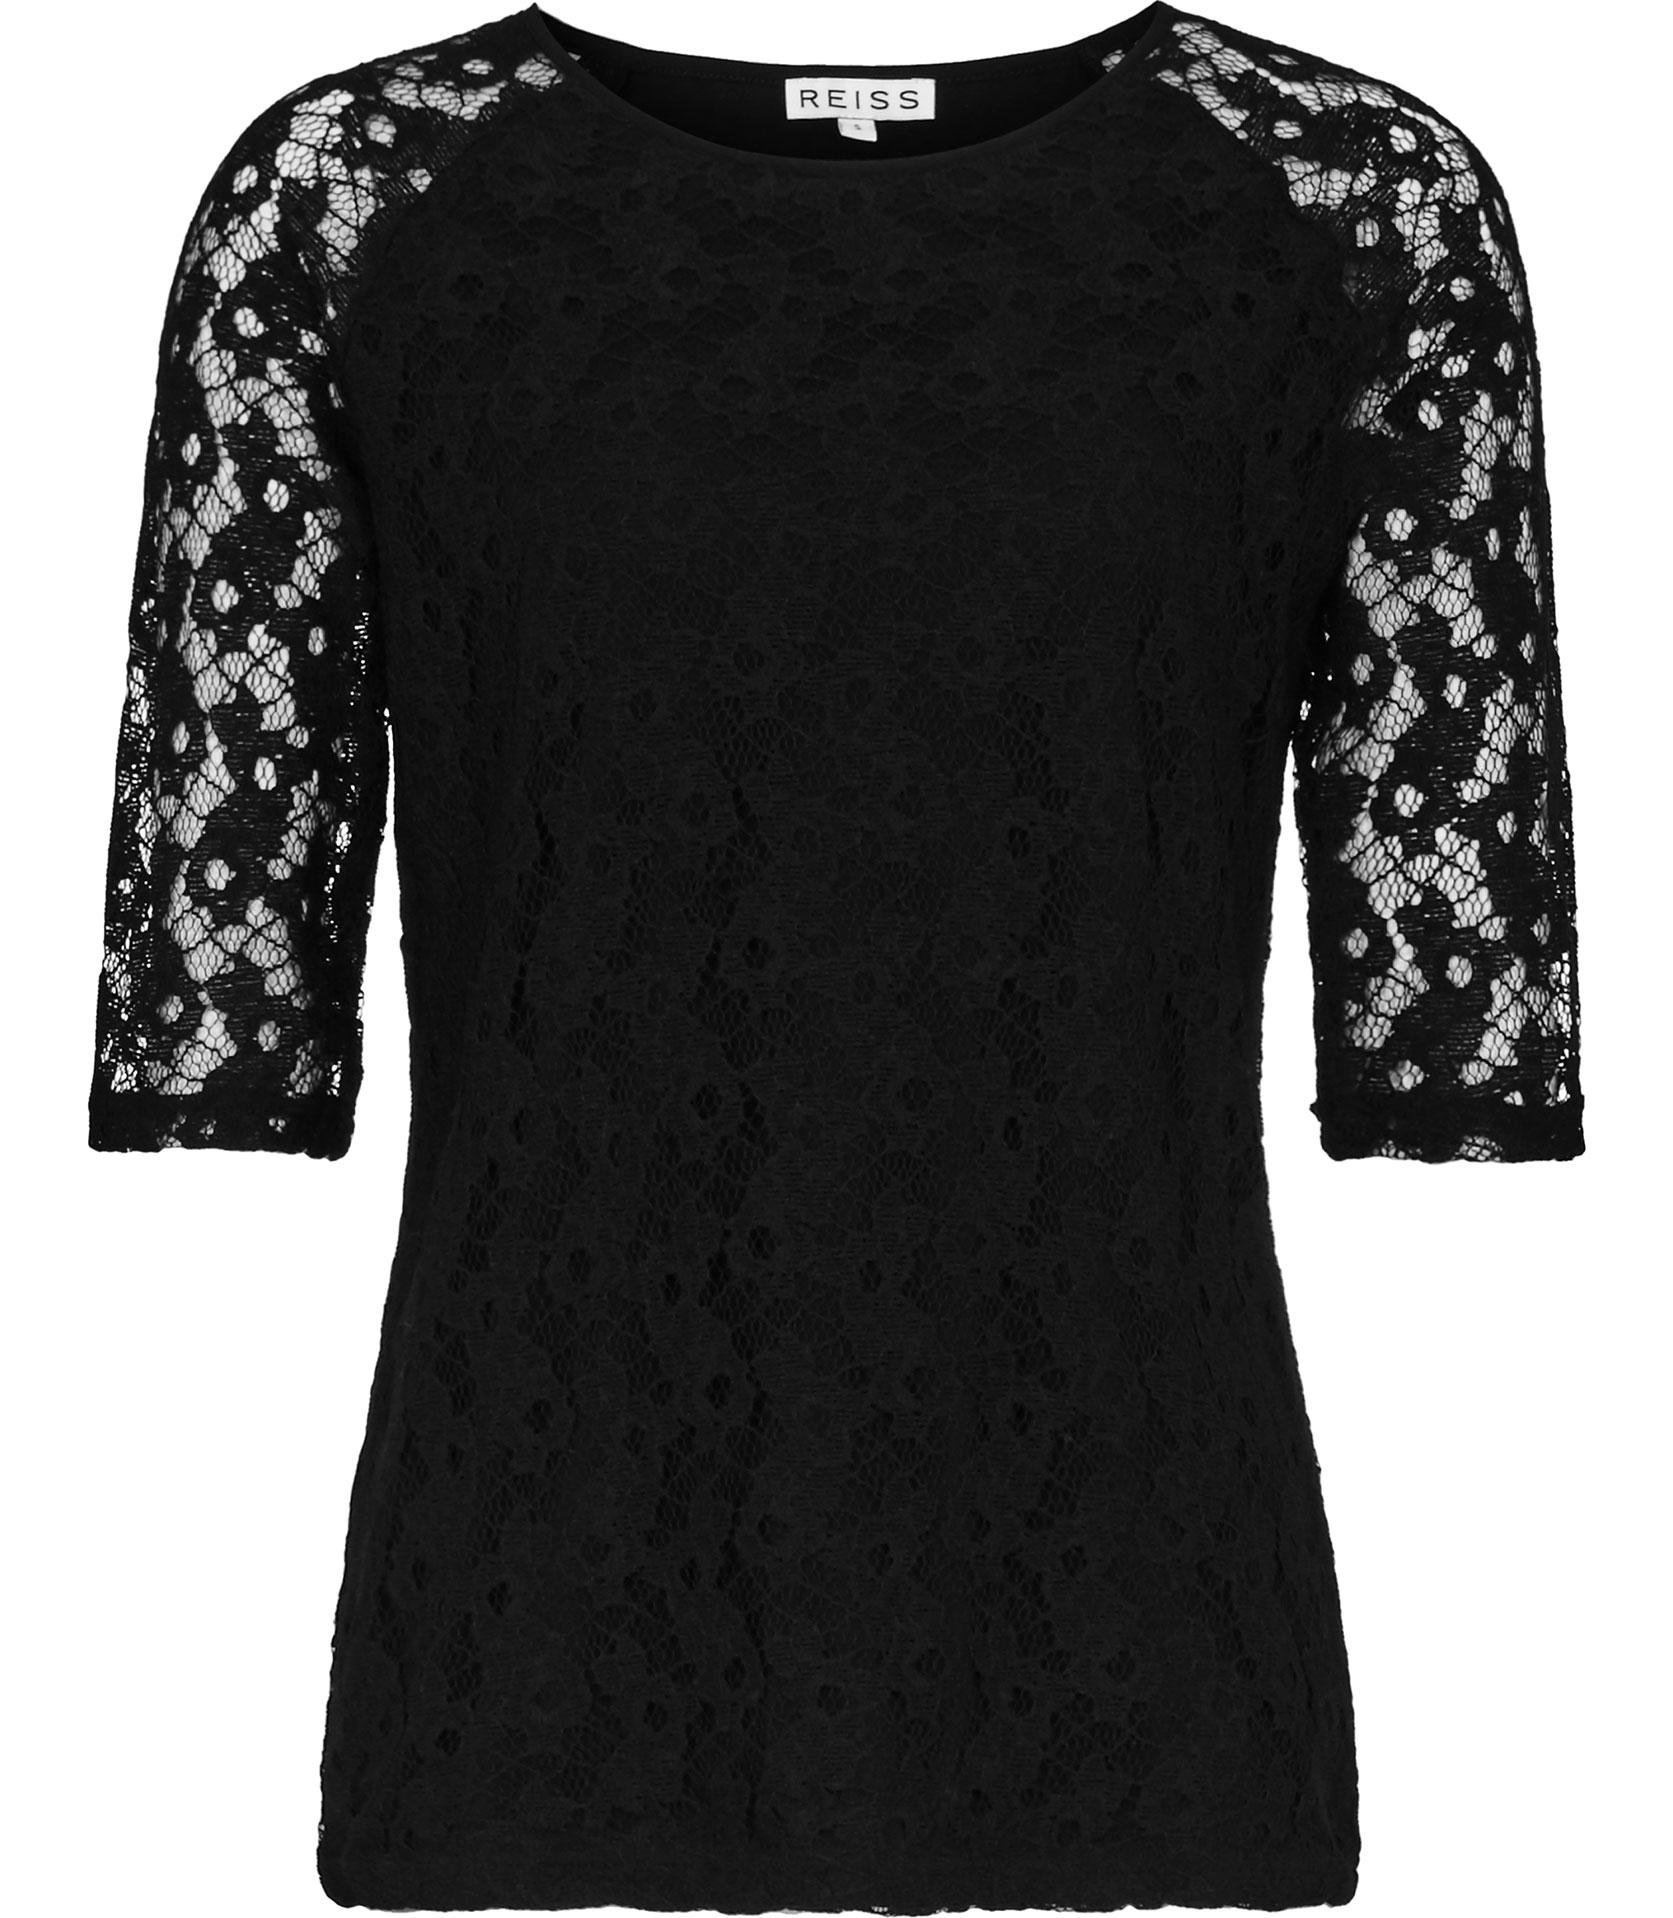 fe50e811b00 Reiss Magnolia Lace T-shirt in Black - Lyst